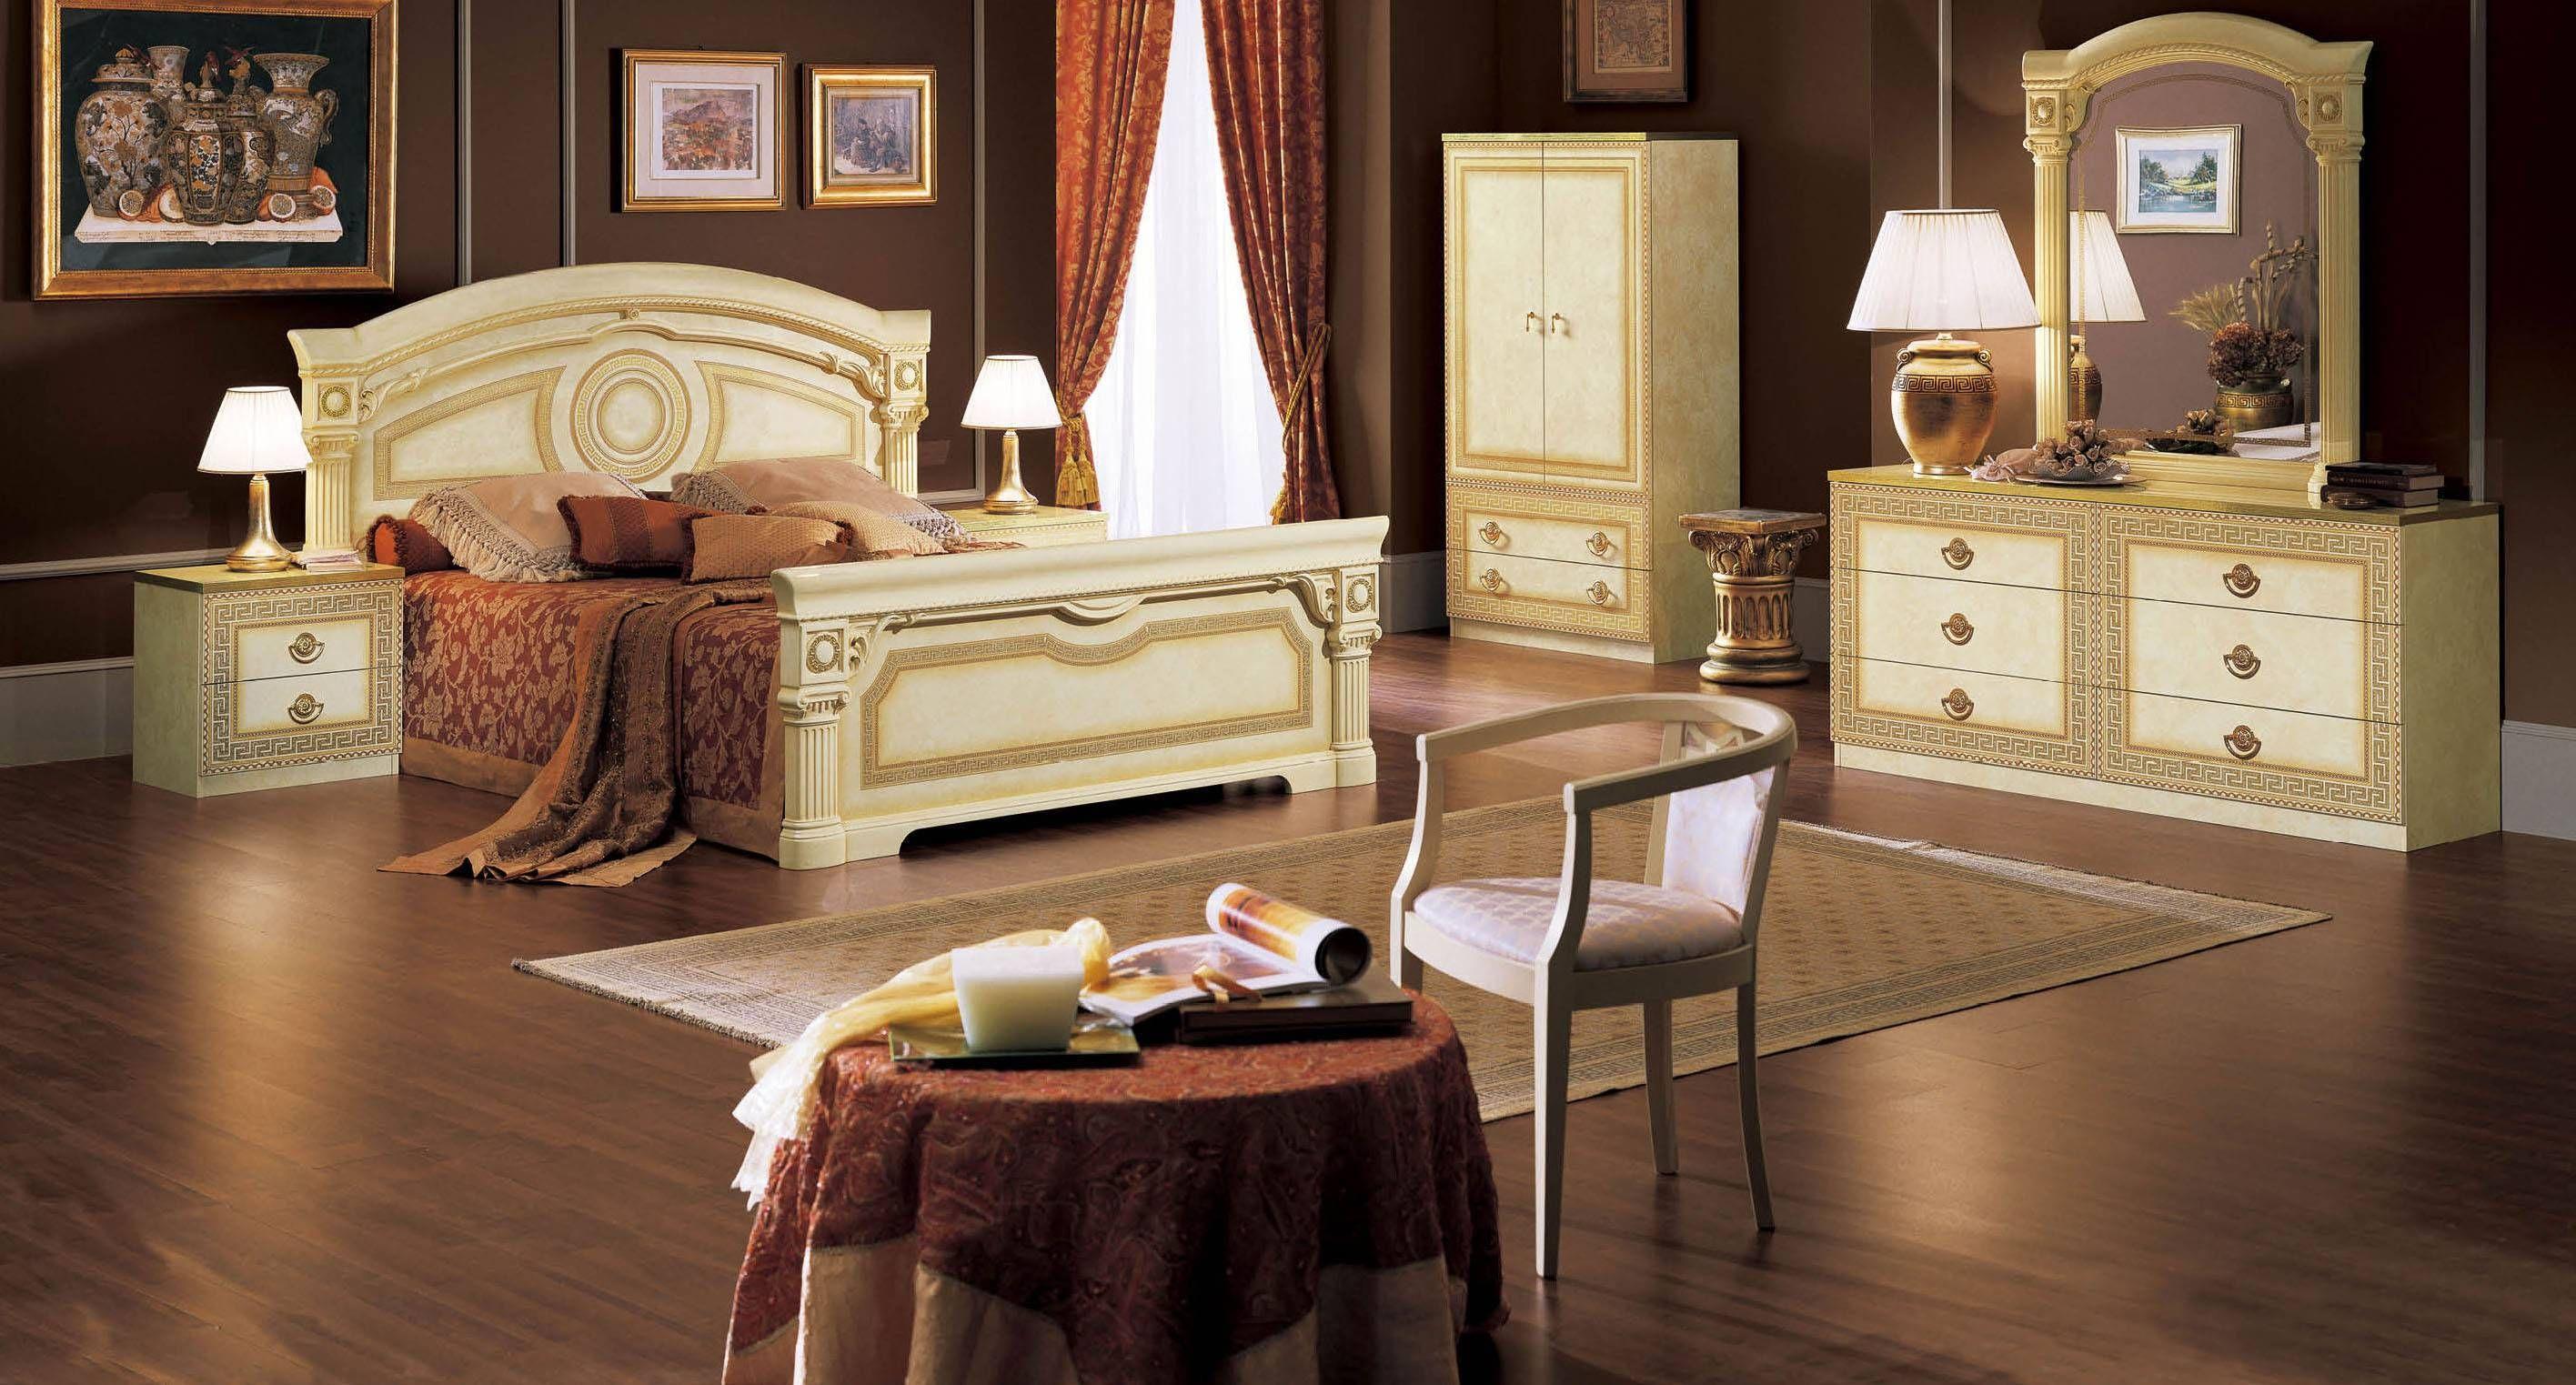 Buy italian furniture online bedroom furniture full size of furniture black furniture retro furniture modern office furniture couch furniture furniture for